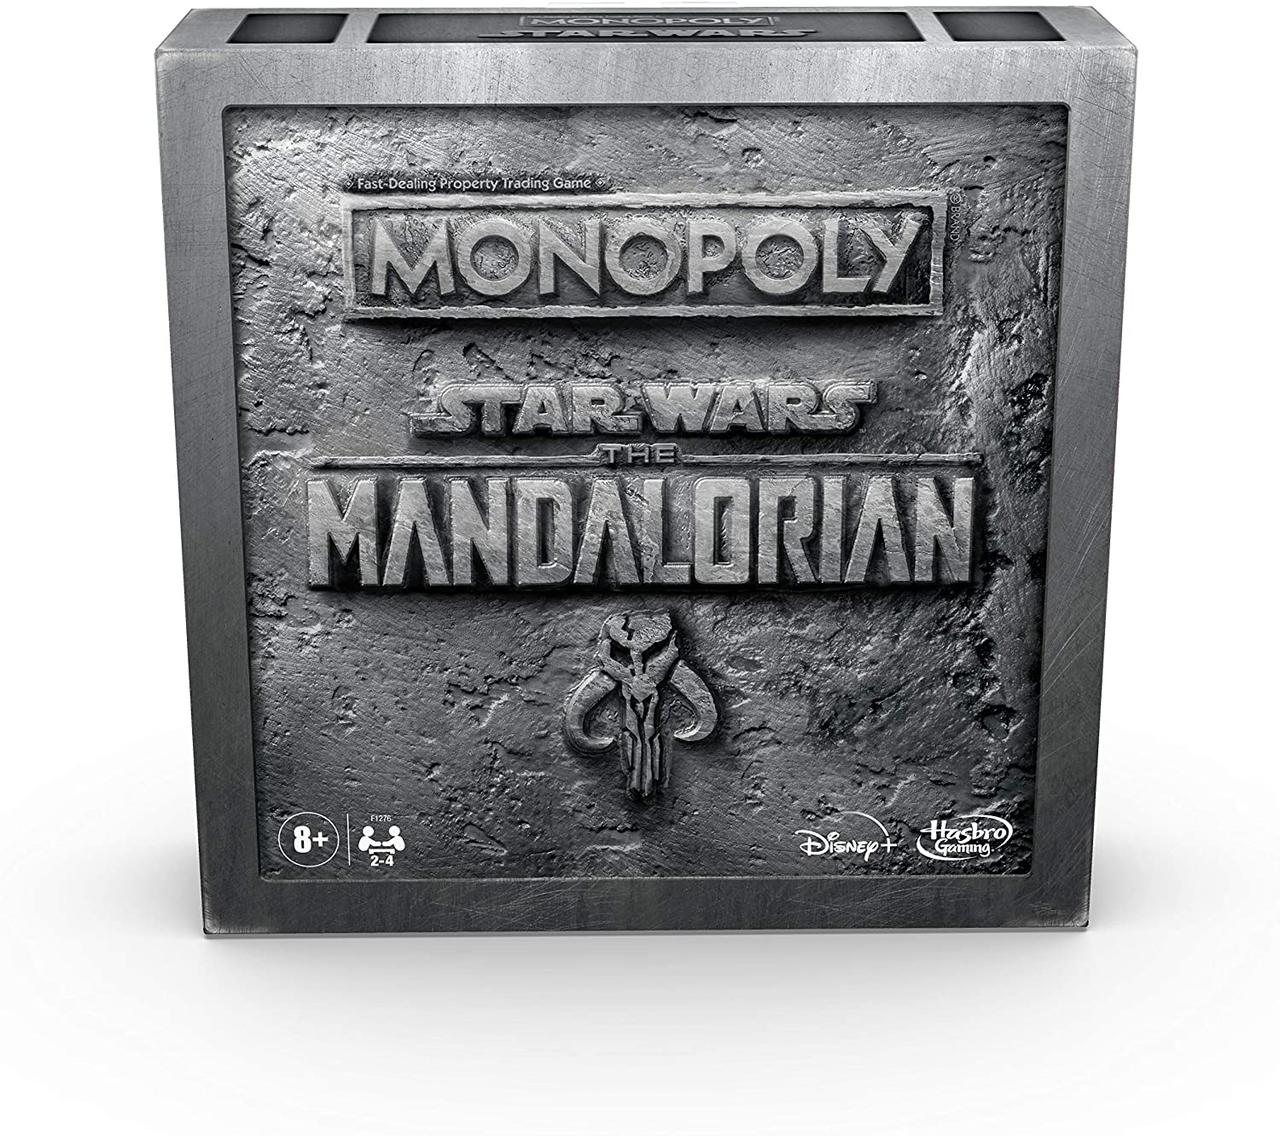 Настольная игра Monopoly: Star Wars The Mandalorian Edition (Монополия: Звёздные война. Мандалорец)